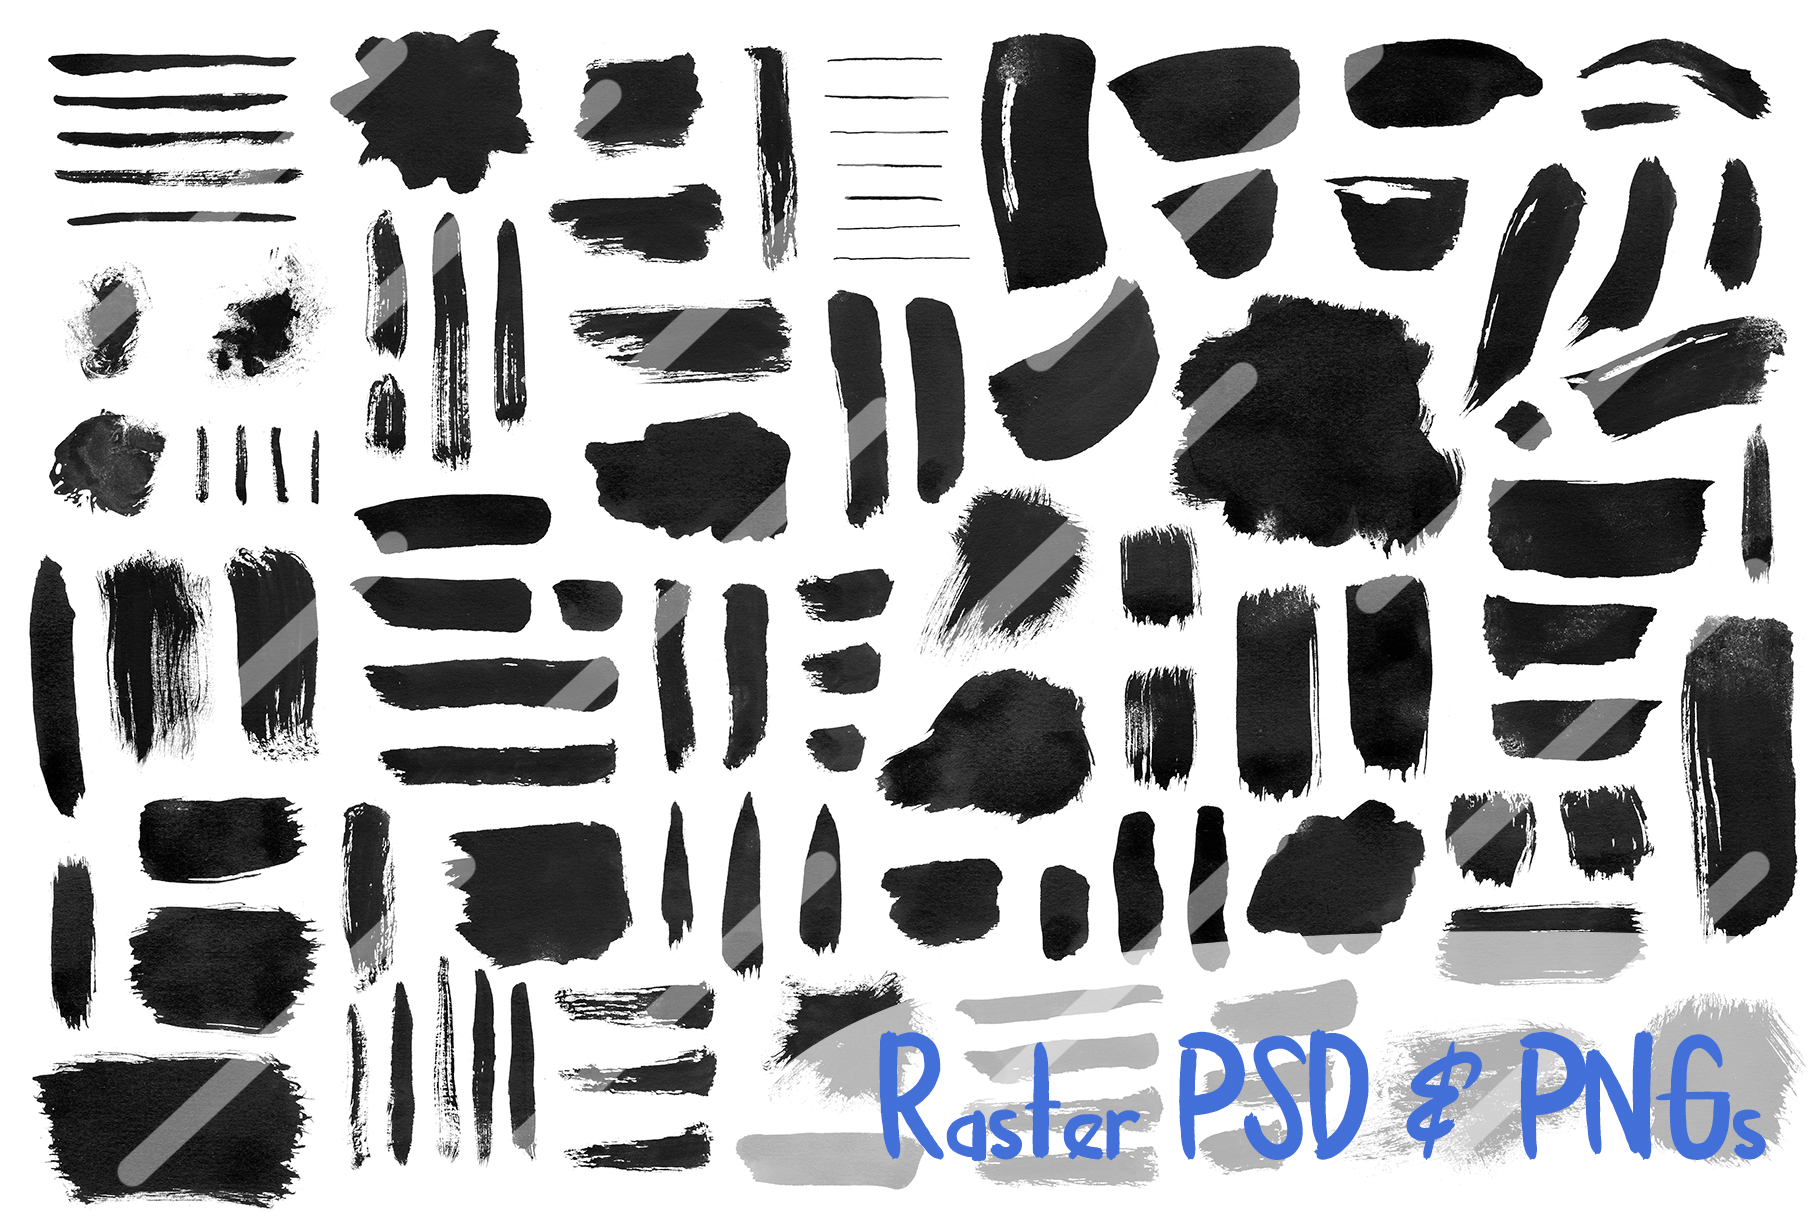 Black Ink Brushes for Adobe Photoshop and Adobe Illustrator example image 2